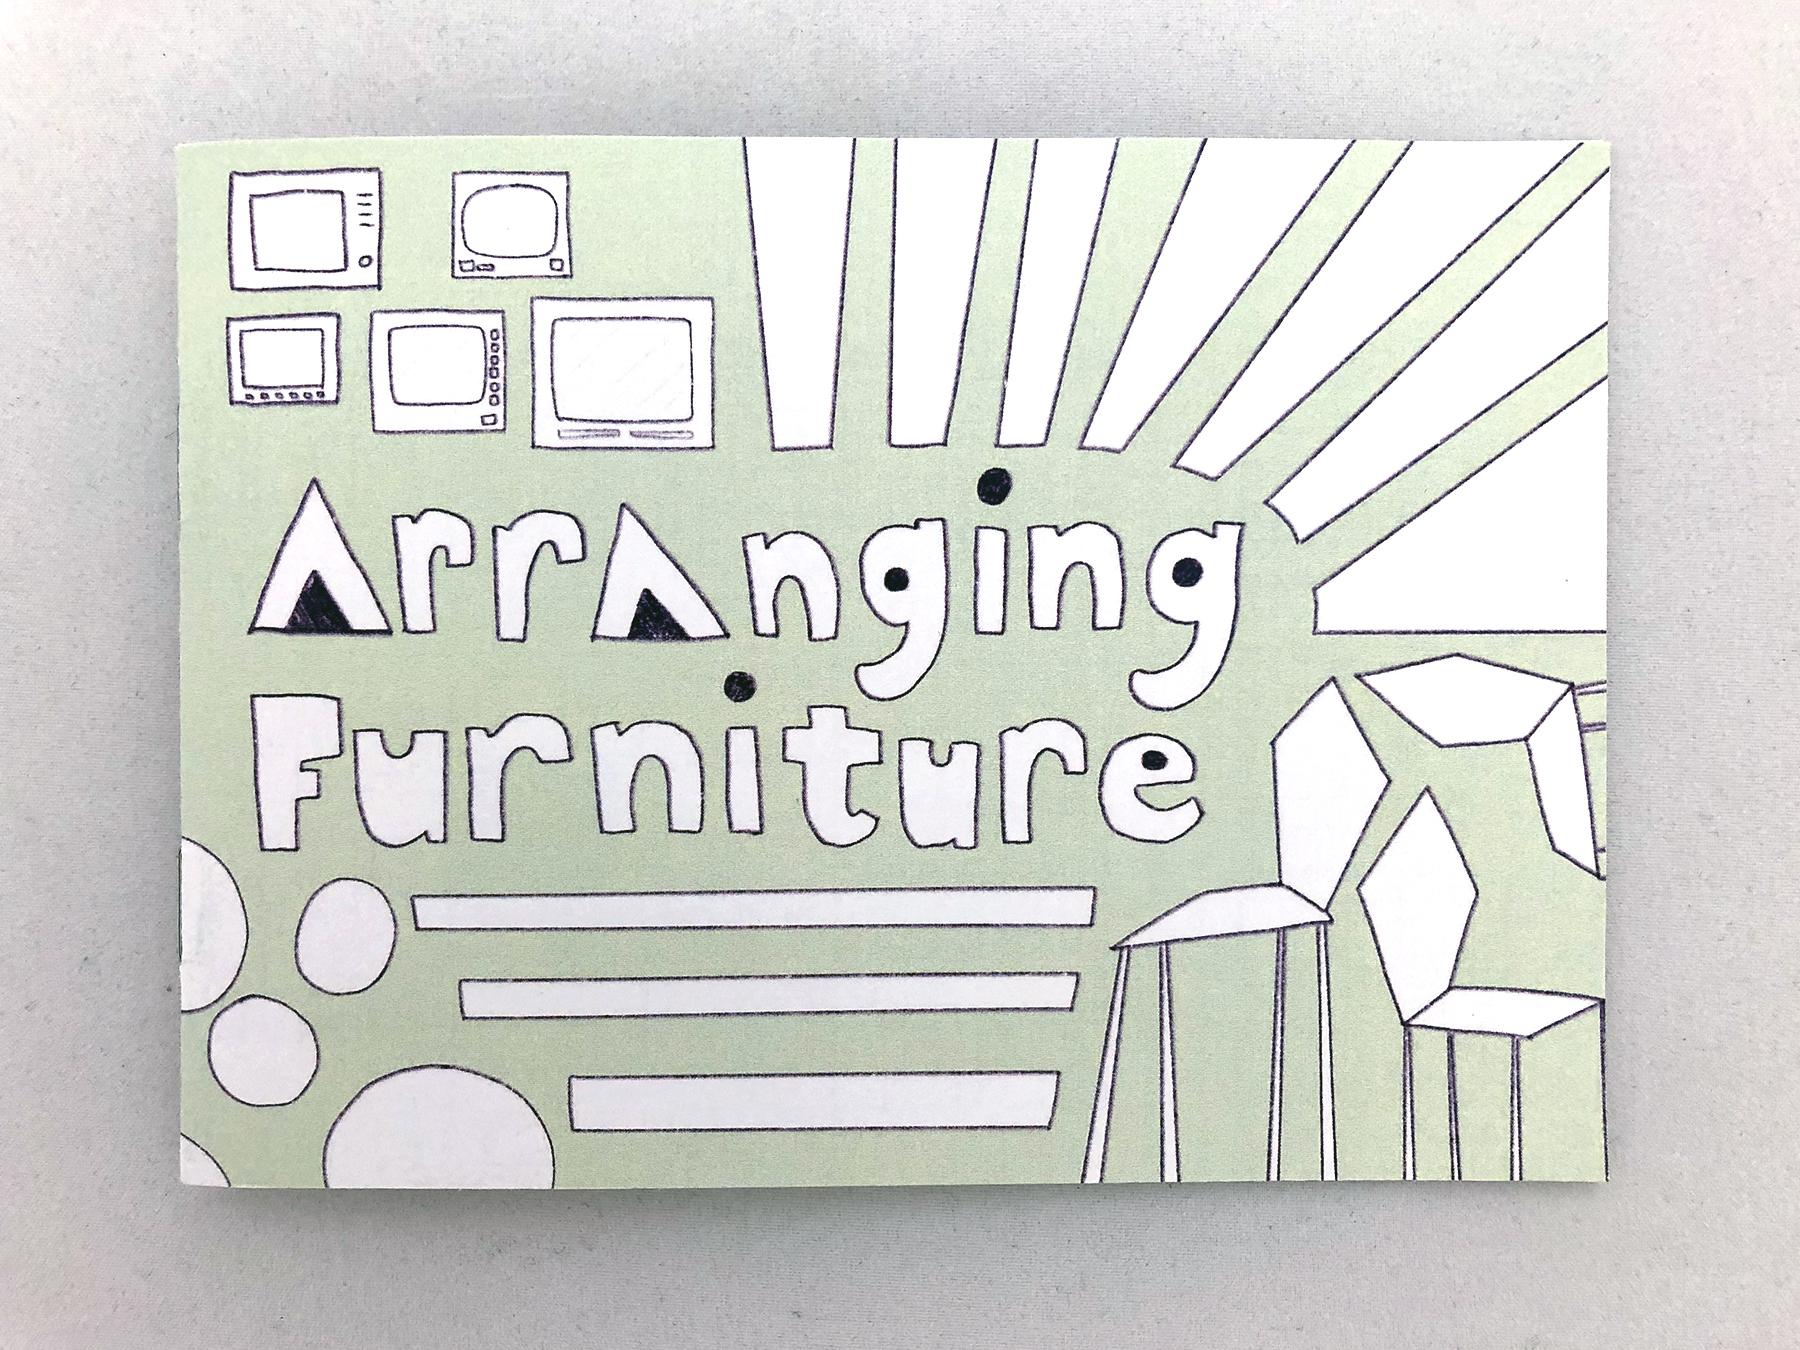 Arranging_Furniture_Cover.jpg